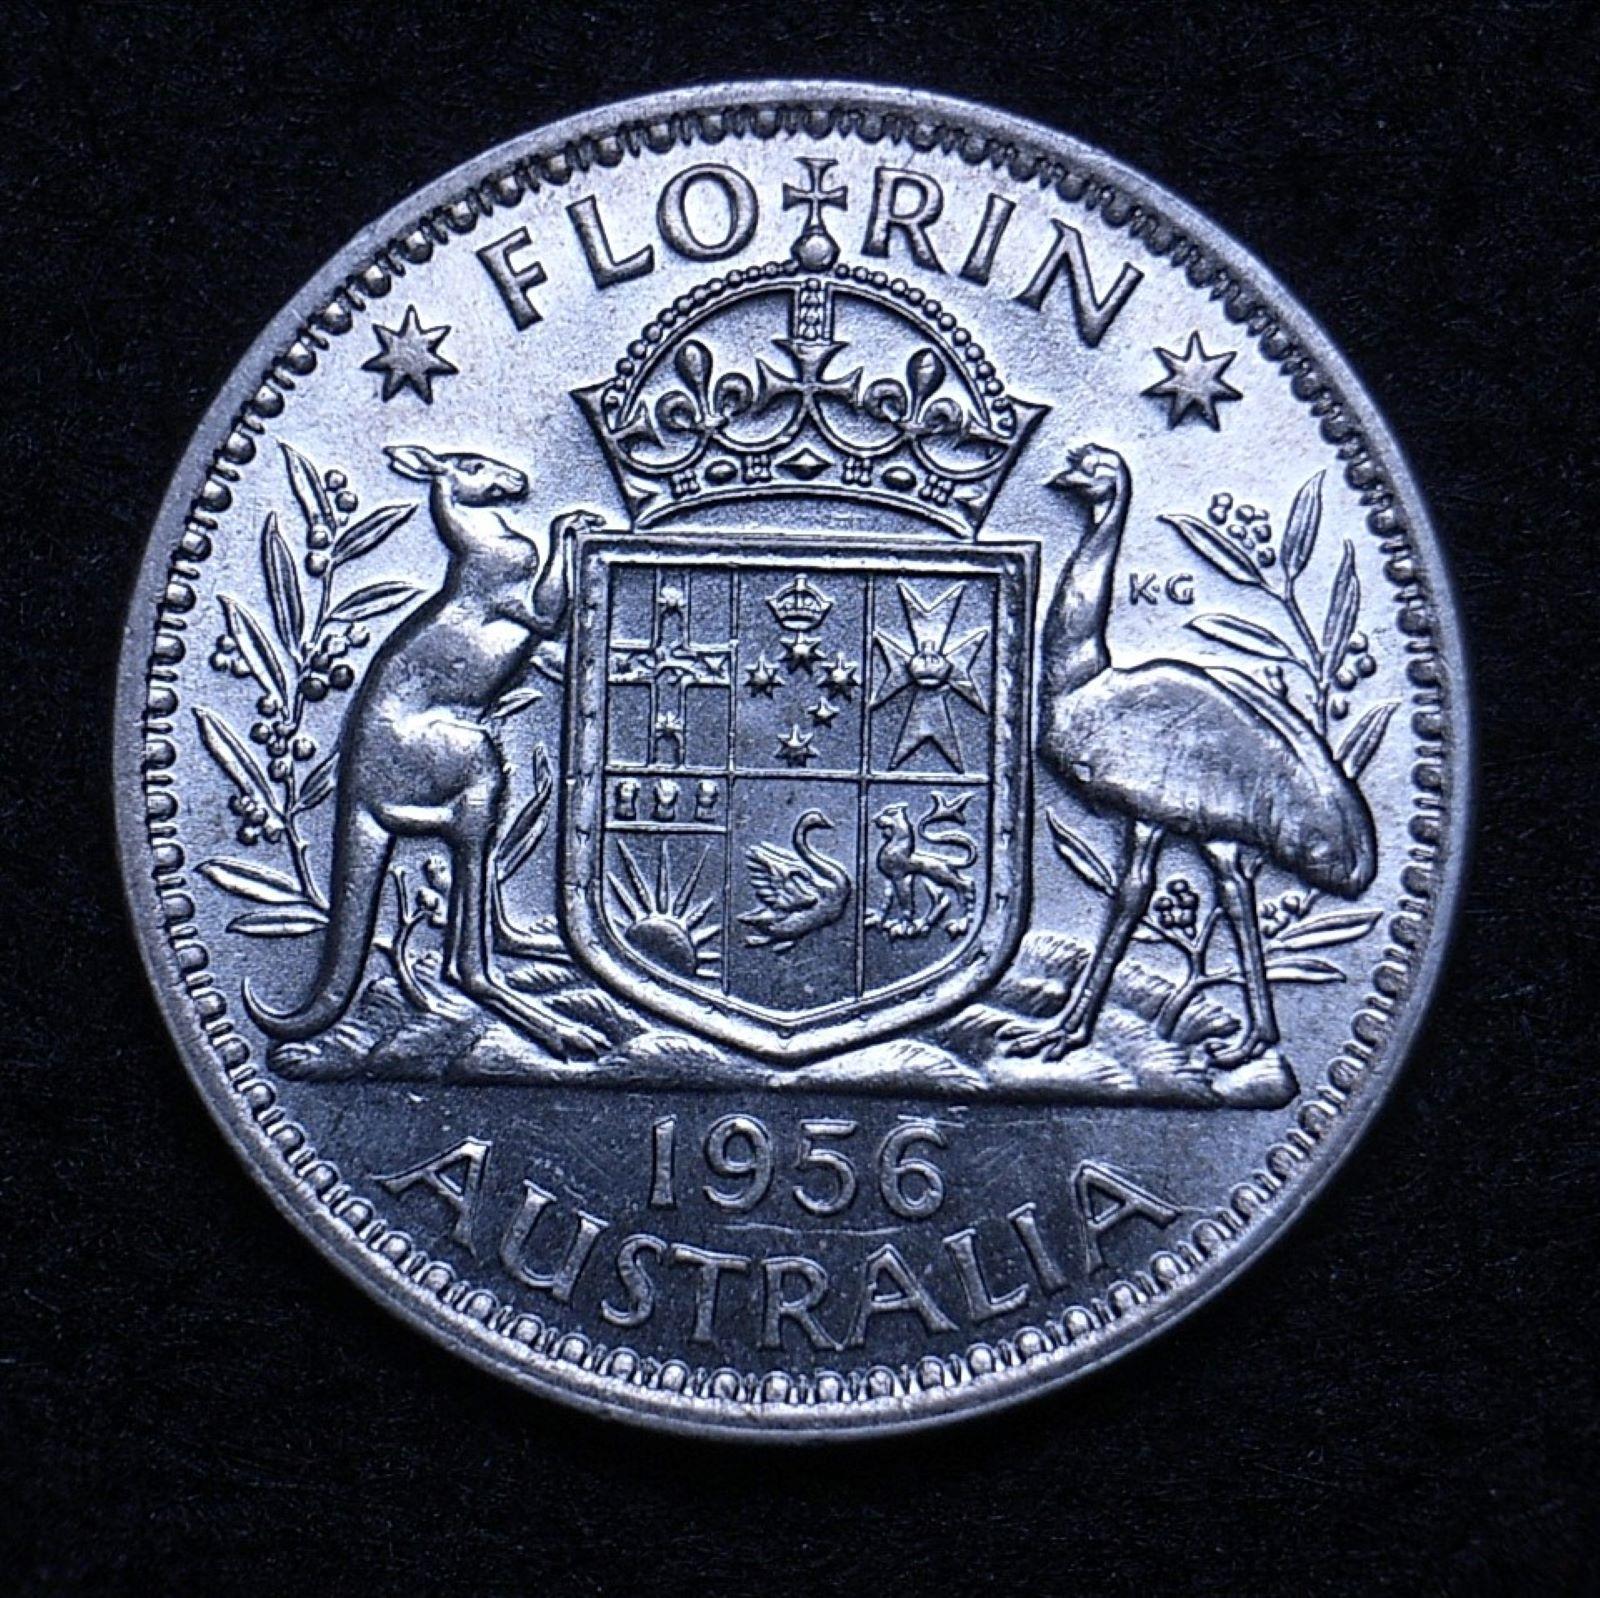 Aus Florin 1956 rev